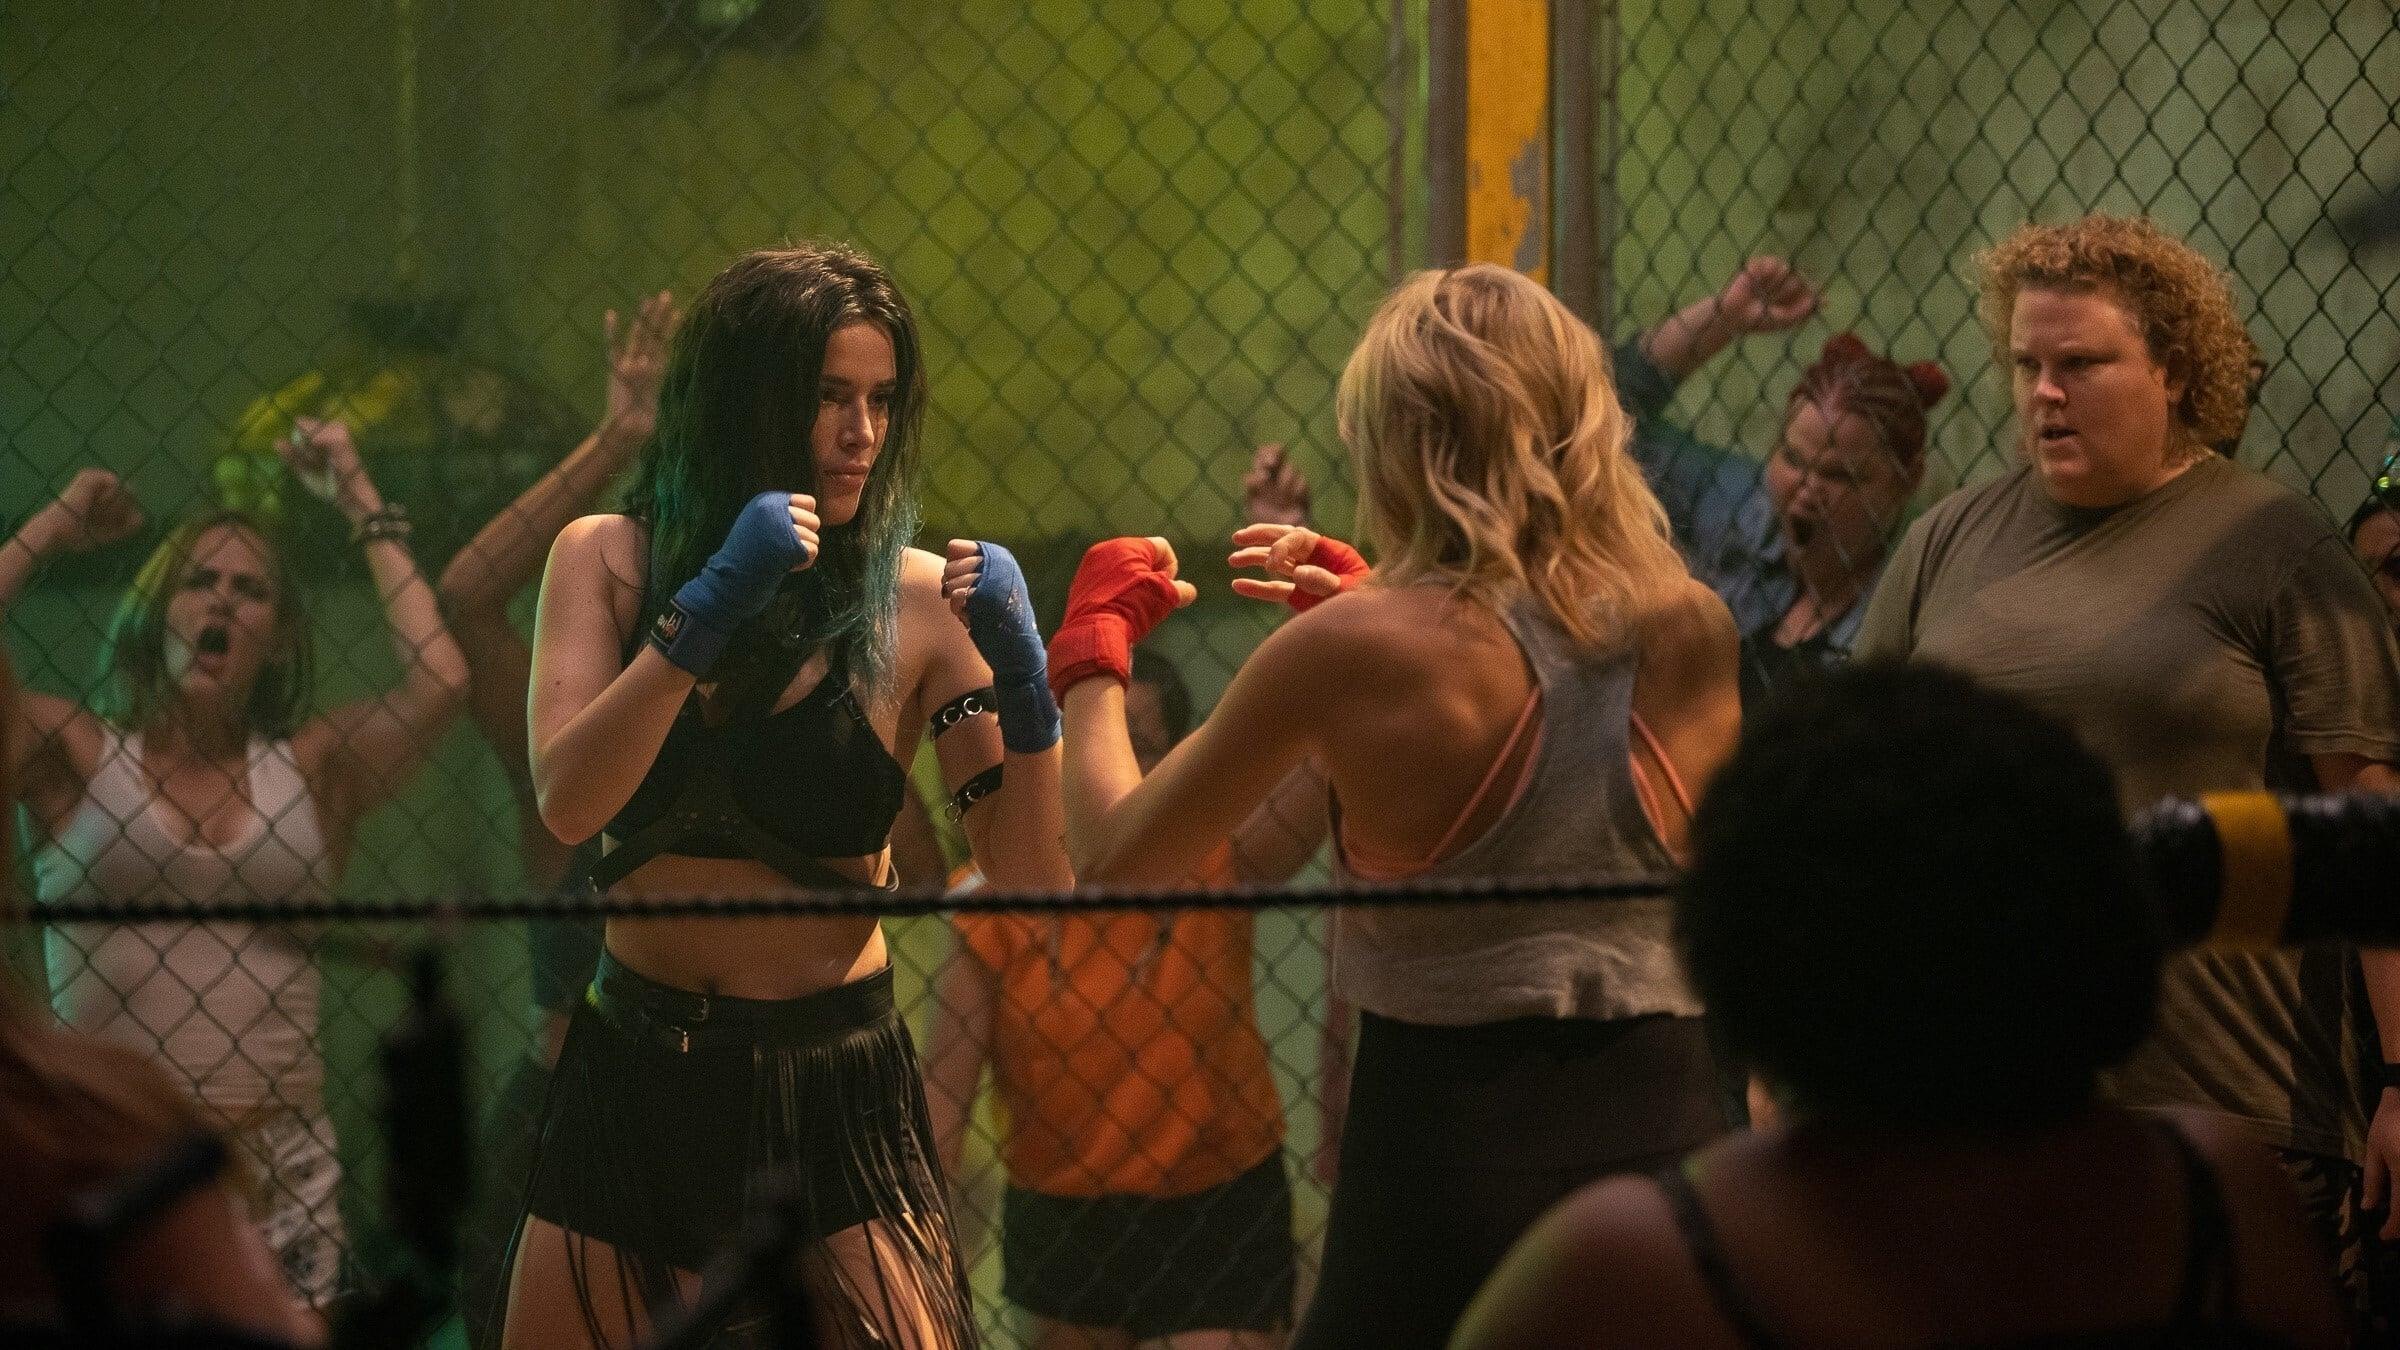 Chick Fight (2021)